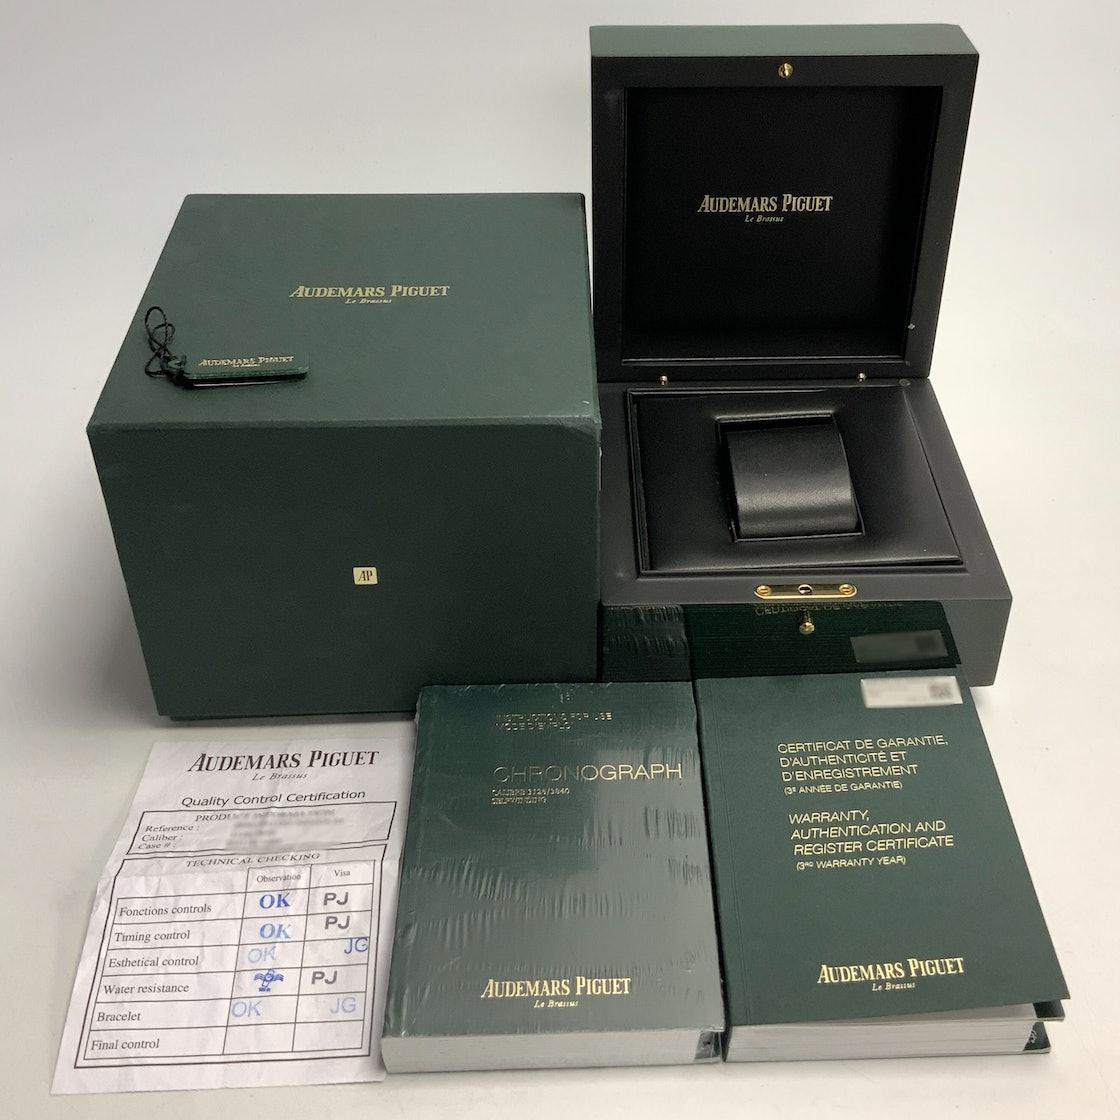 Audemars Piguet Royal Oak Offshore Chronograph 26401RO.OO.A002CA.01